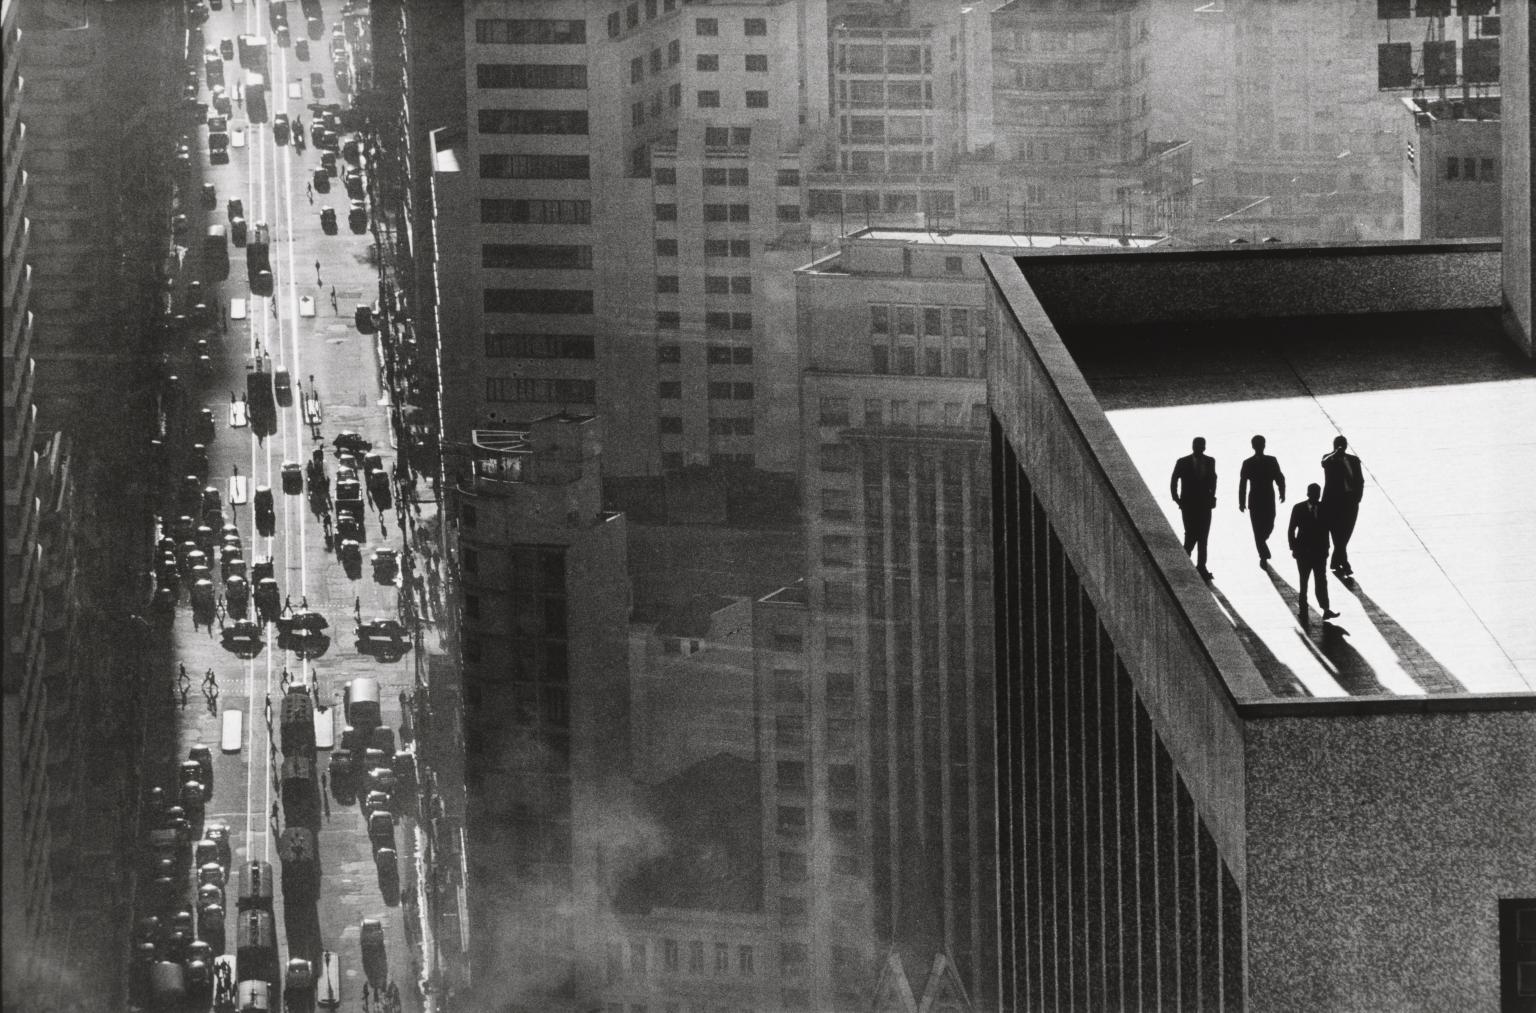 René Burri / Magnum Photos